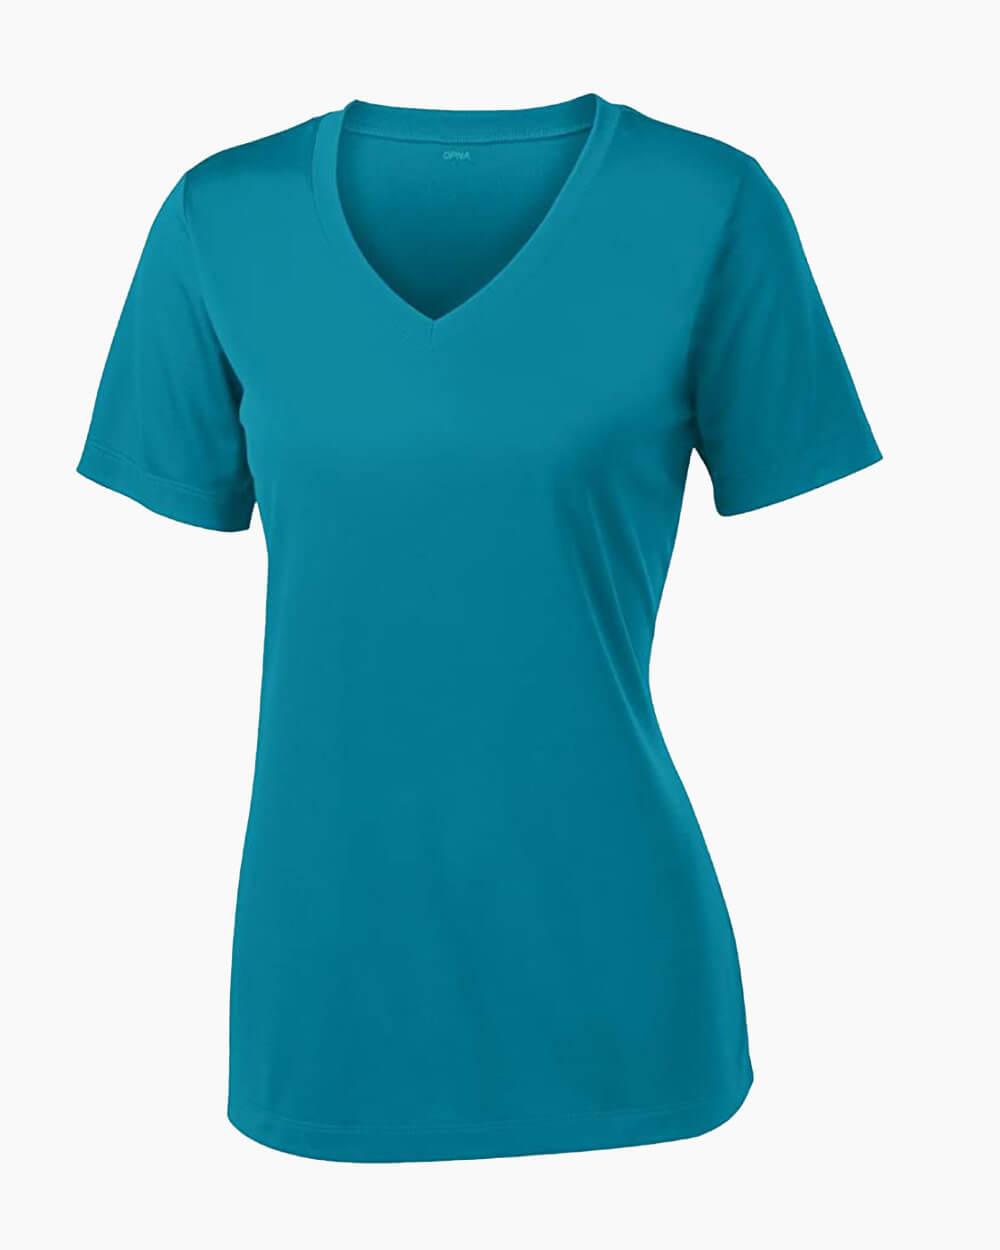 Opna cheap workout clothes